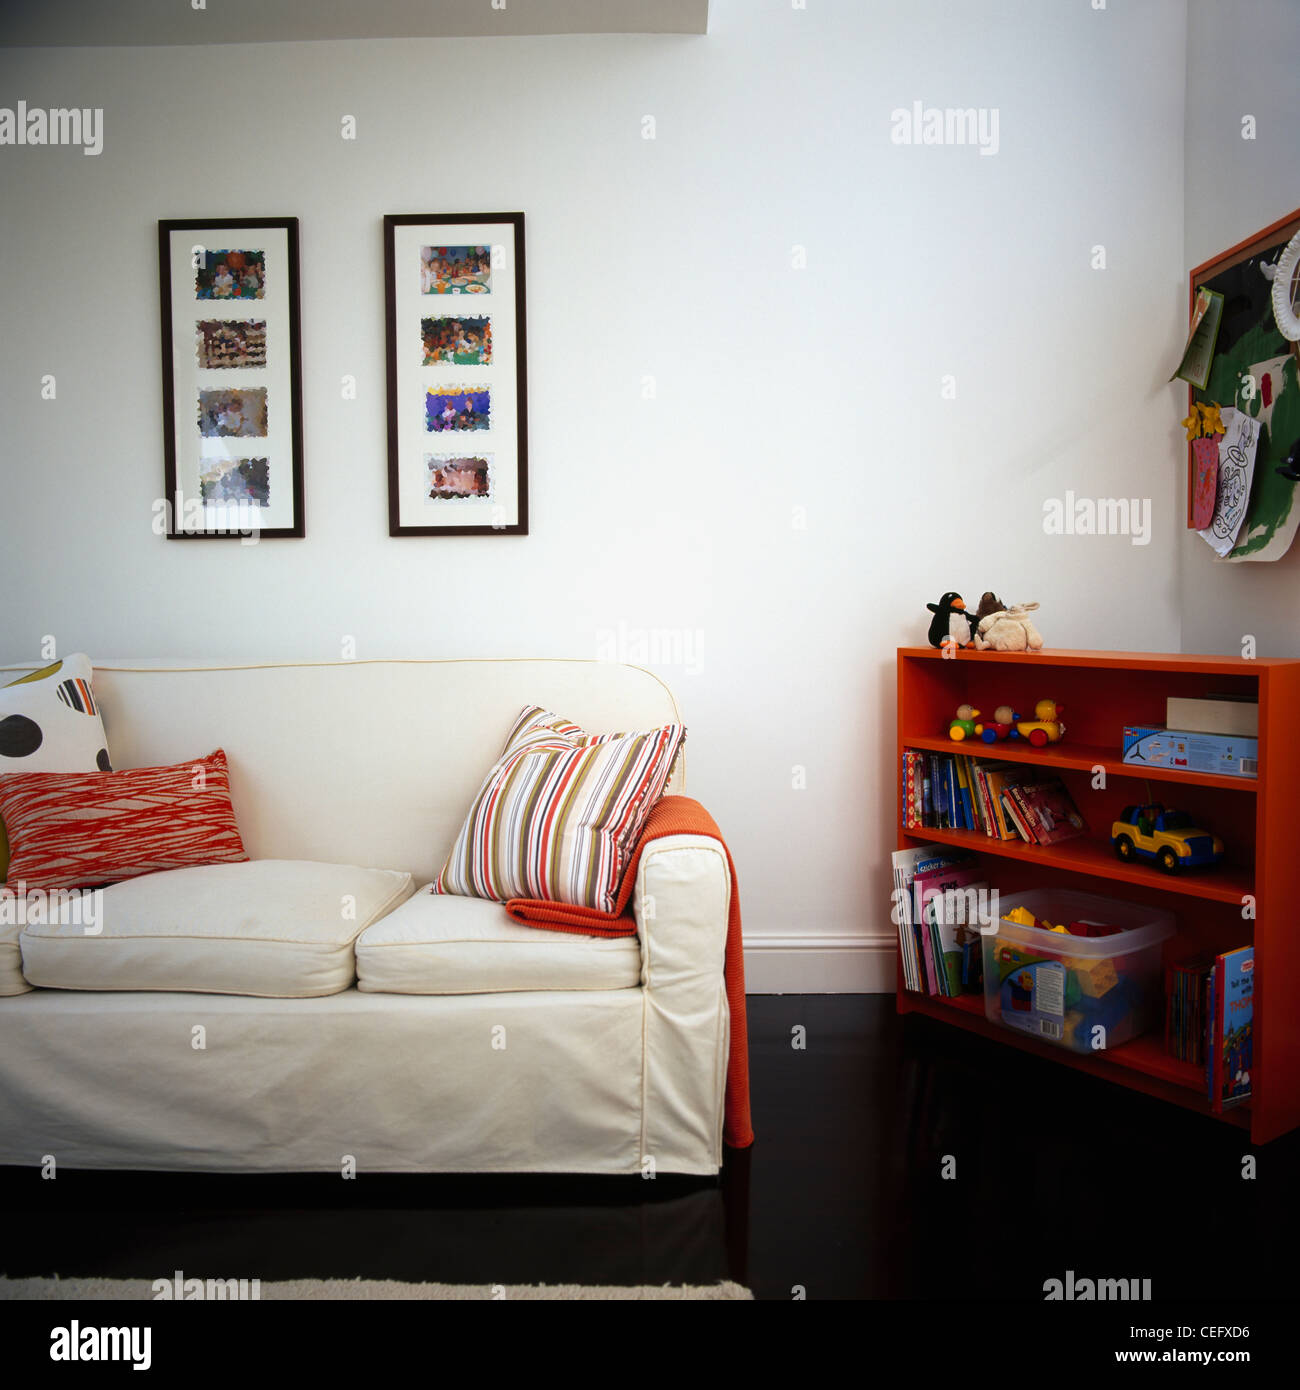 Framed Photographs Living Room Stock Photos & Framed Photographs ...